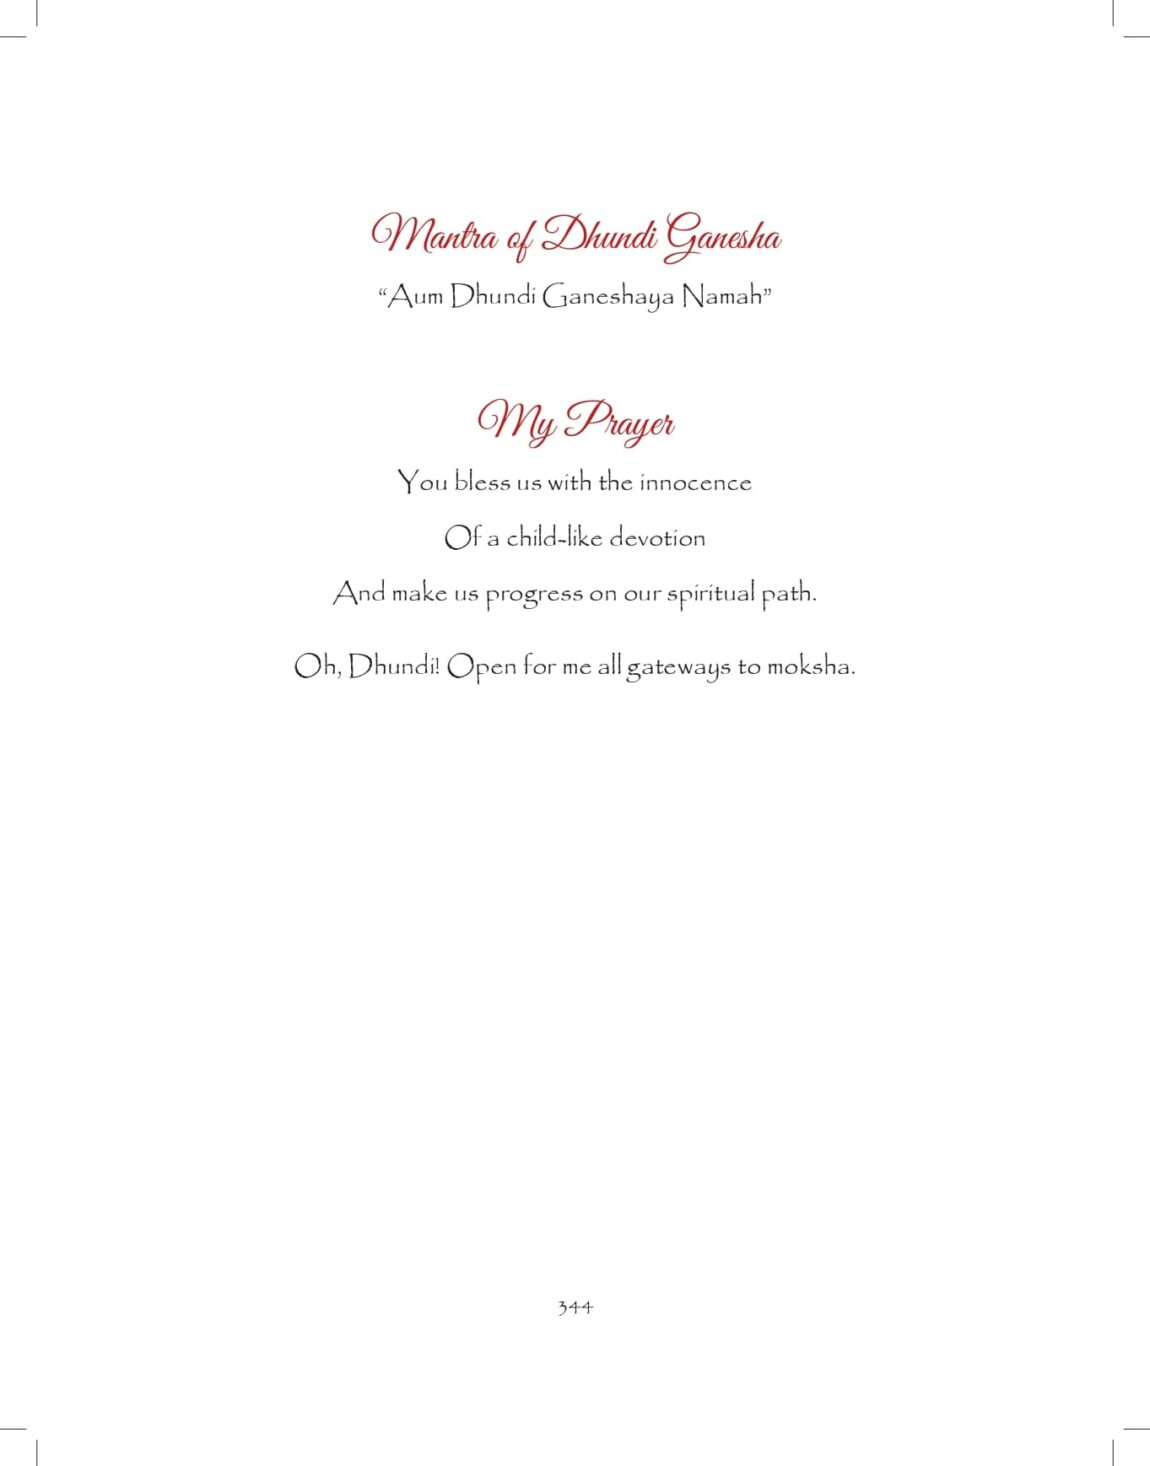 Ganesh-print_pages-to-jpg-0344.jpg